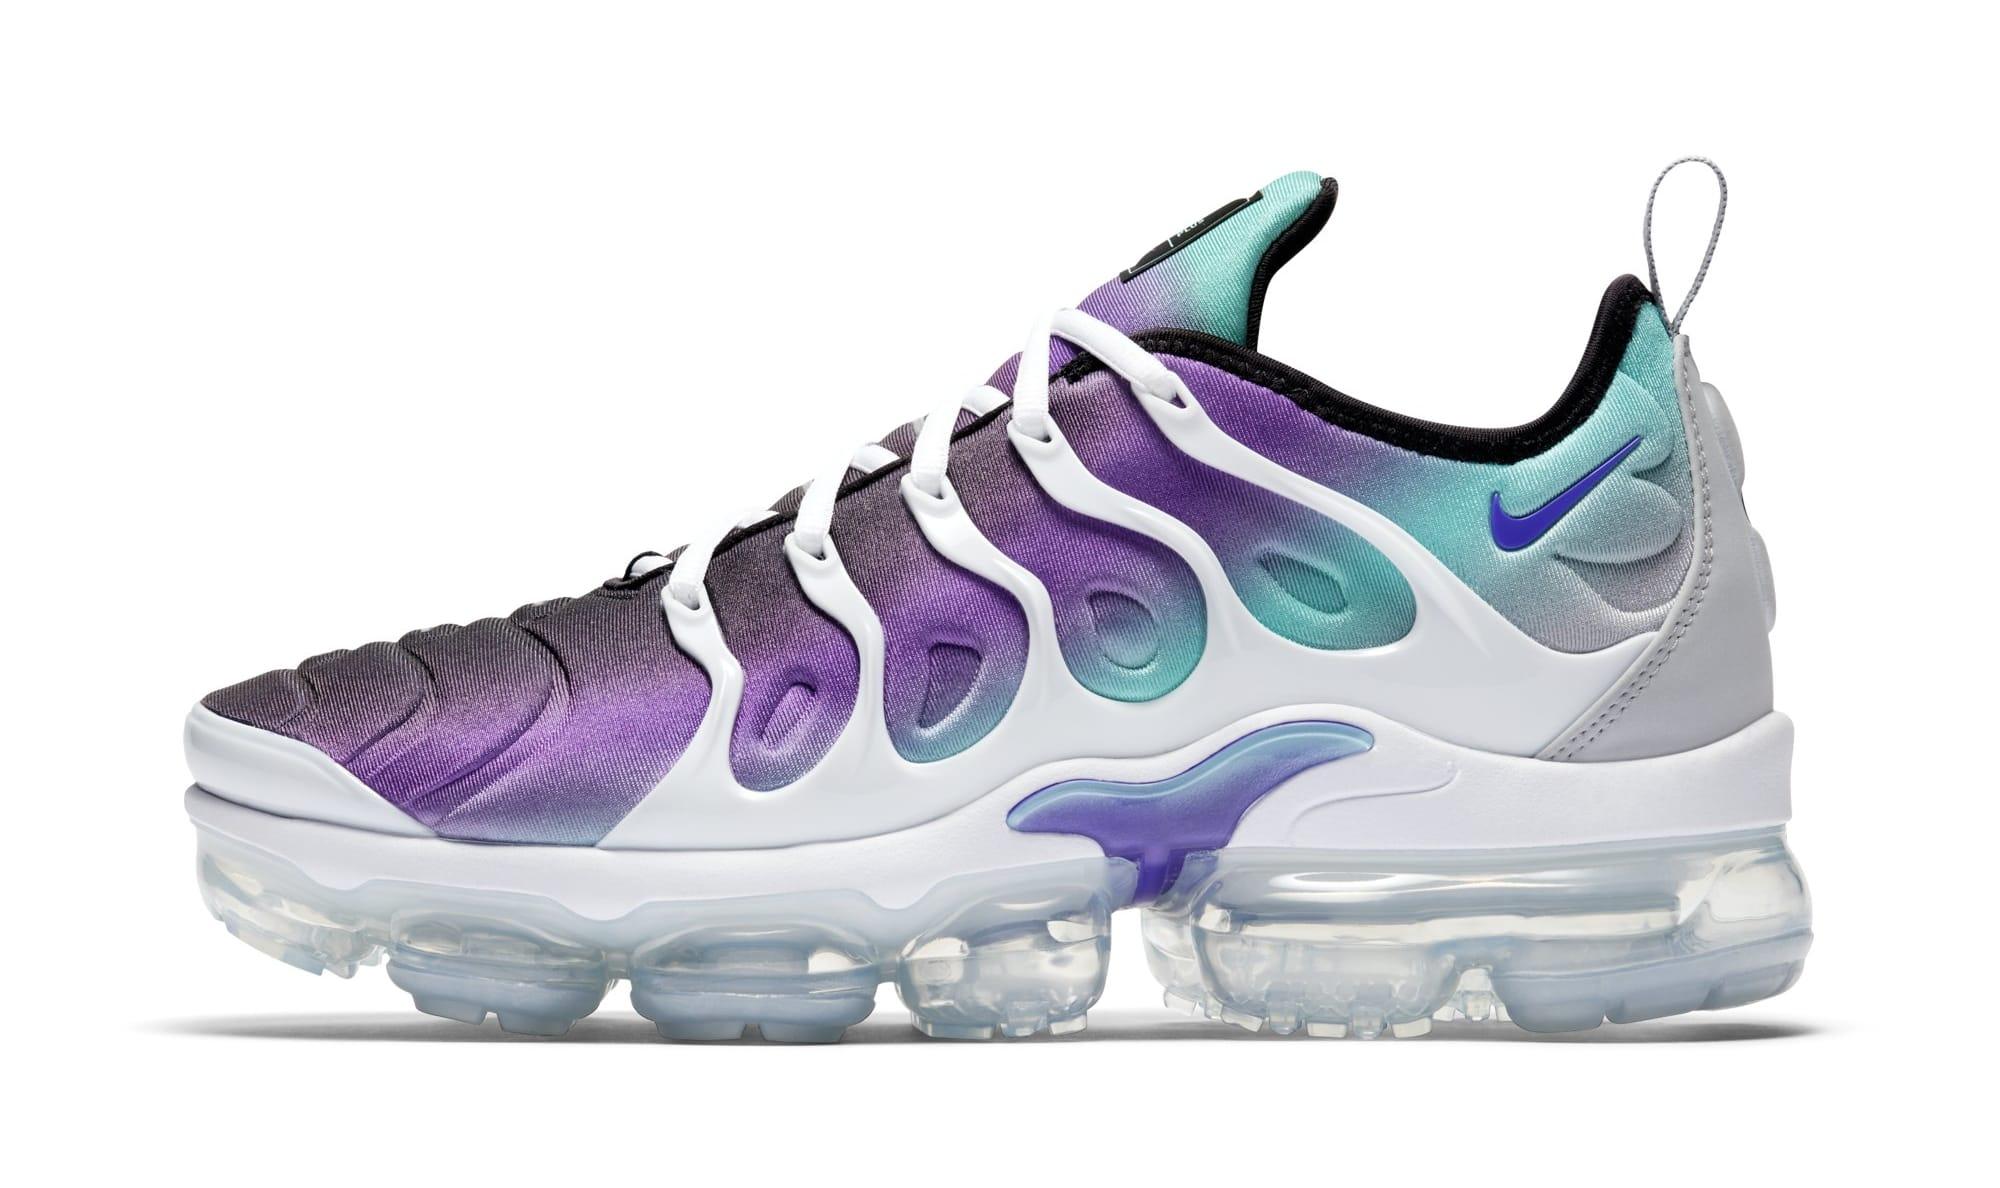 Nike Air VaporMax Plus 'Purple/Aqua' 924453-101 (Lateral)